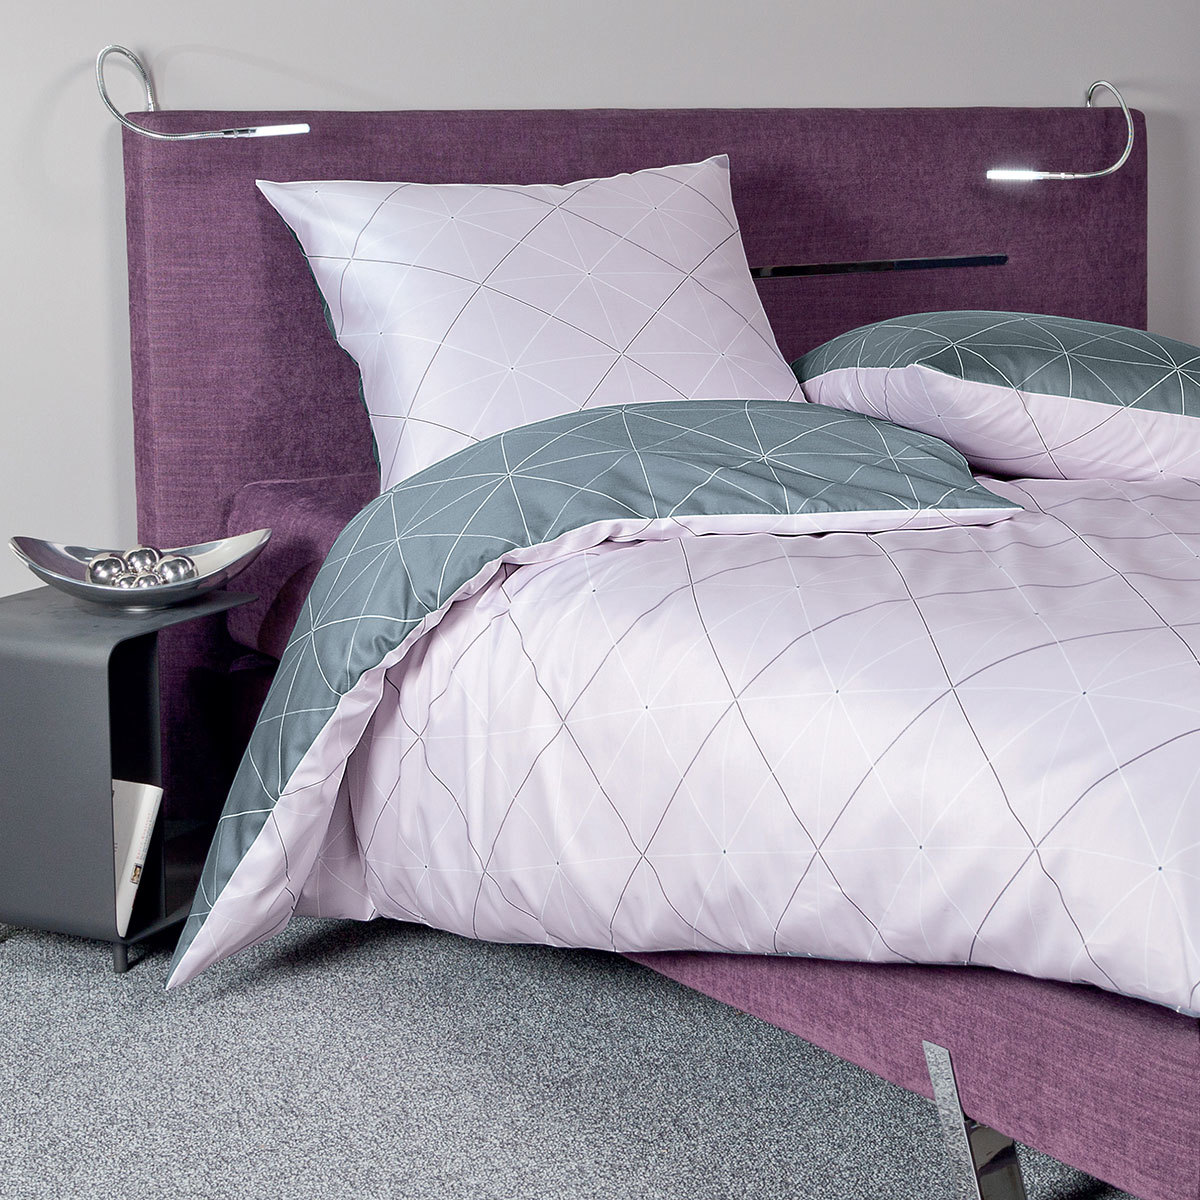 janine mako satin bettw sche j d 87026 01 kreiderose silber g nstig online kaufen bei bettwaren. Black Bedroom Furniture Sets. Home Design Ideas